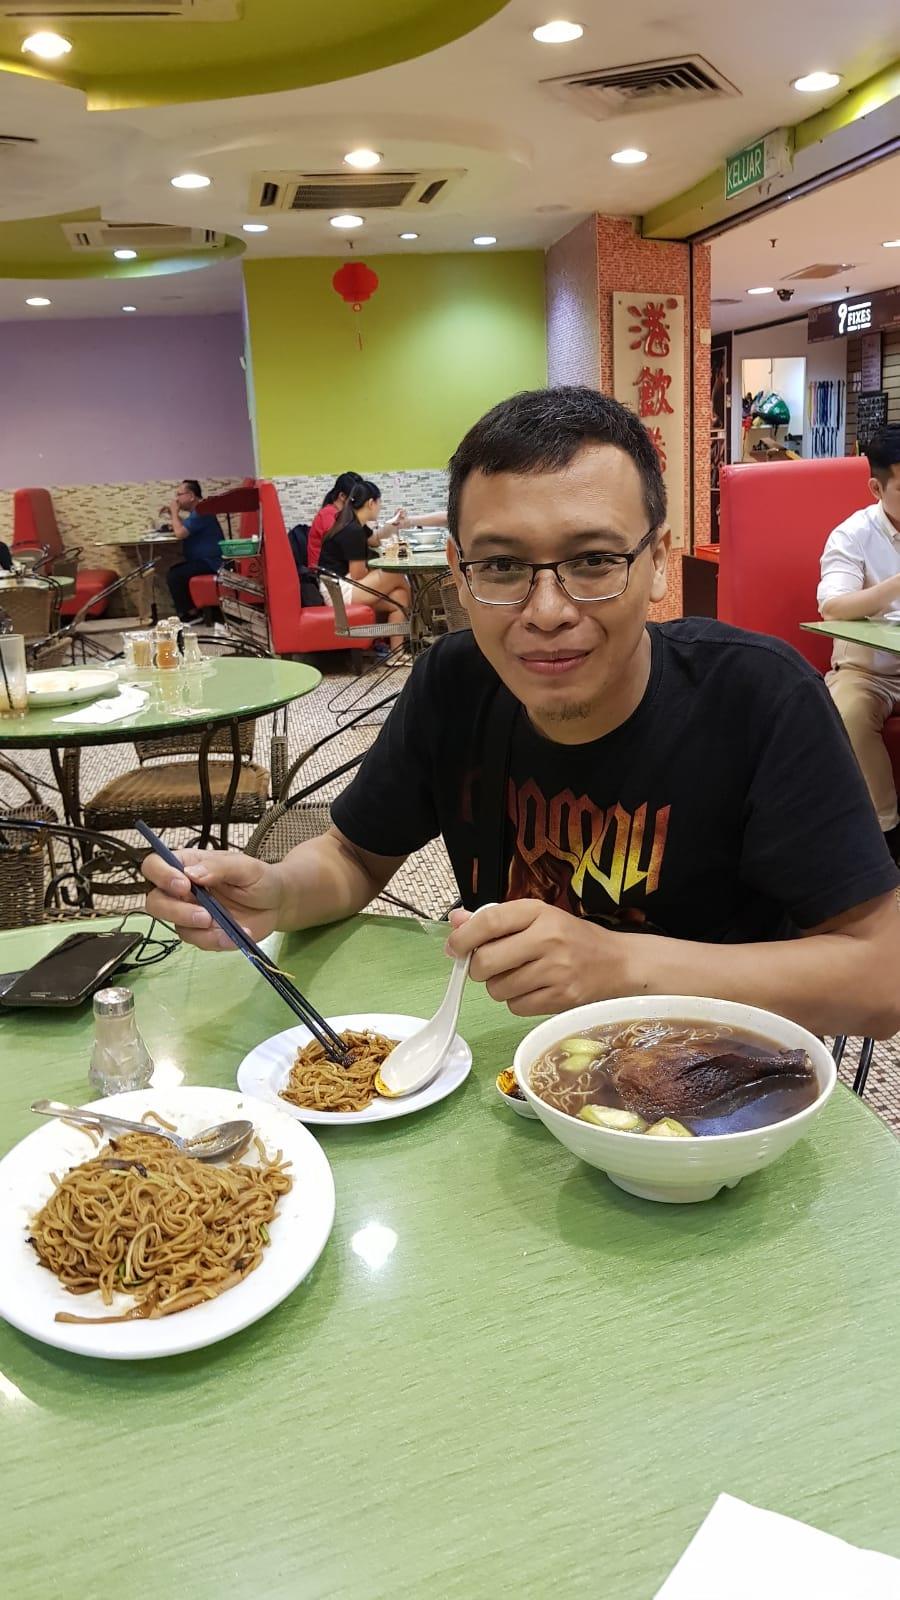 TIPS BACKPACKER JALAN-JALAN HEMAT DI MALAYSIA, MENIKMATI KULINER NEGERIJIRAN